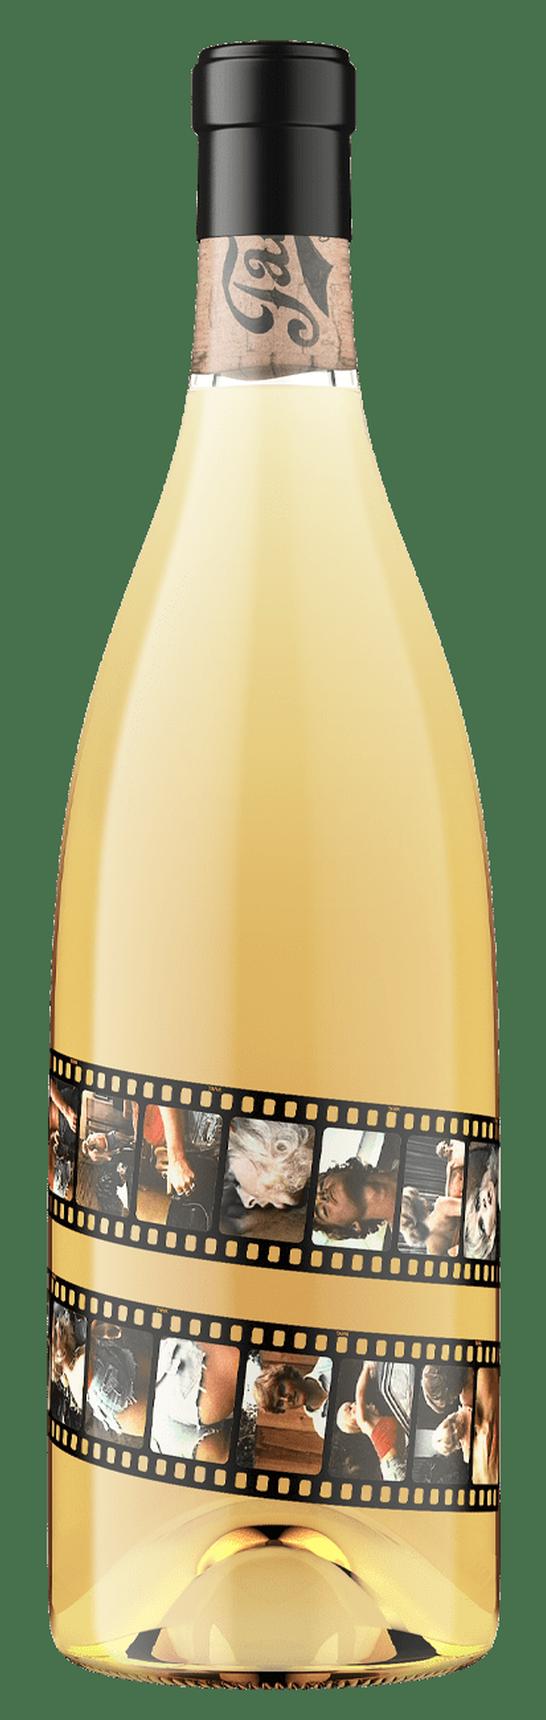 2018 Skin Flick, Skin-Fermented White Wine, Sierra Foothills